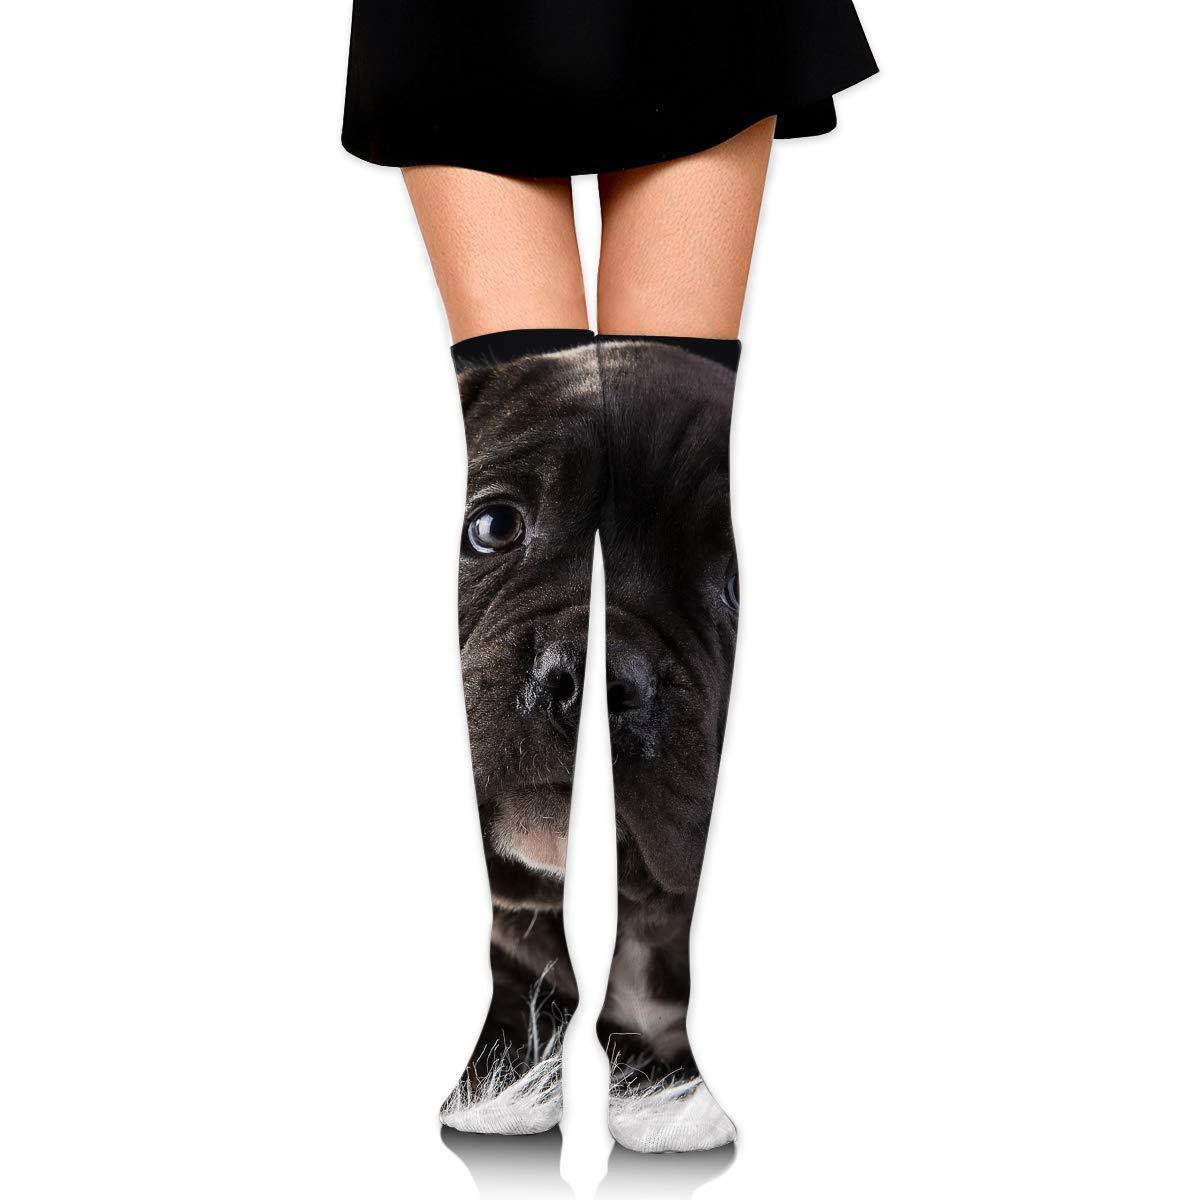 High Elasticity Girl Cotton Knee High Socks Uniform Cute Puppy Black Dog Women Tube Socks